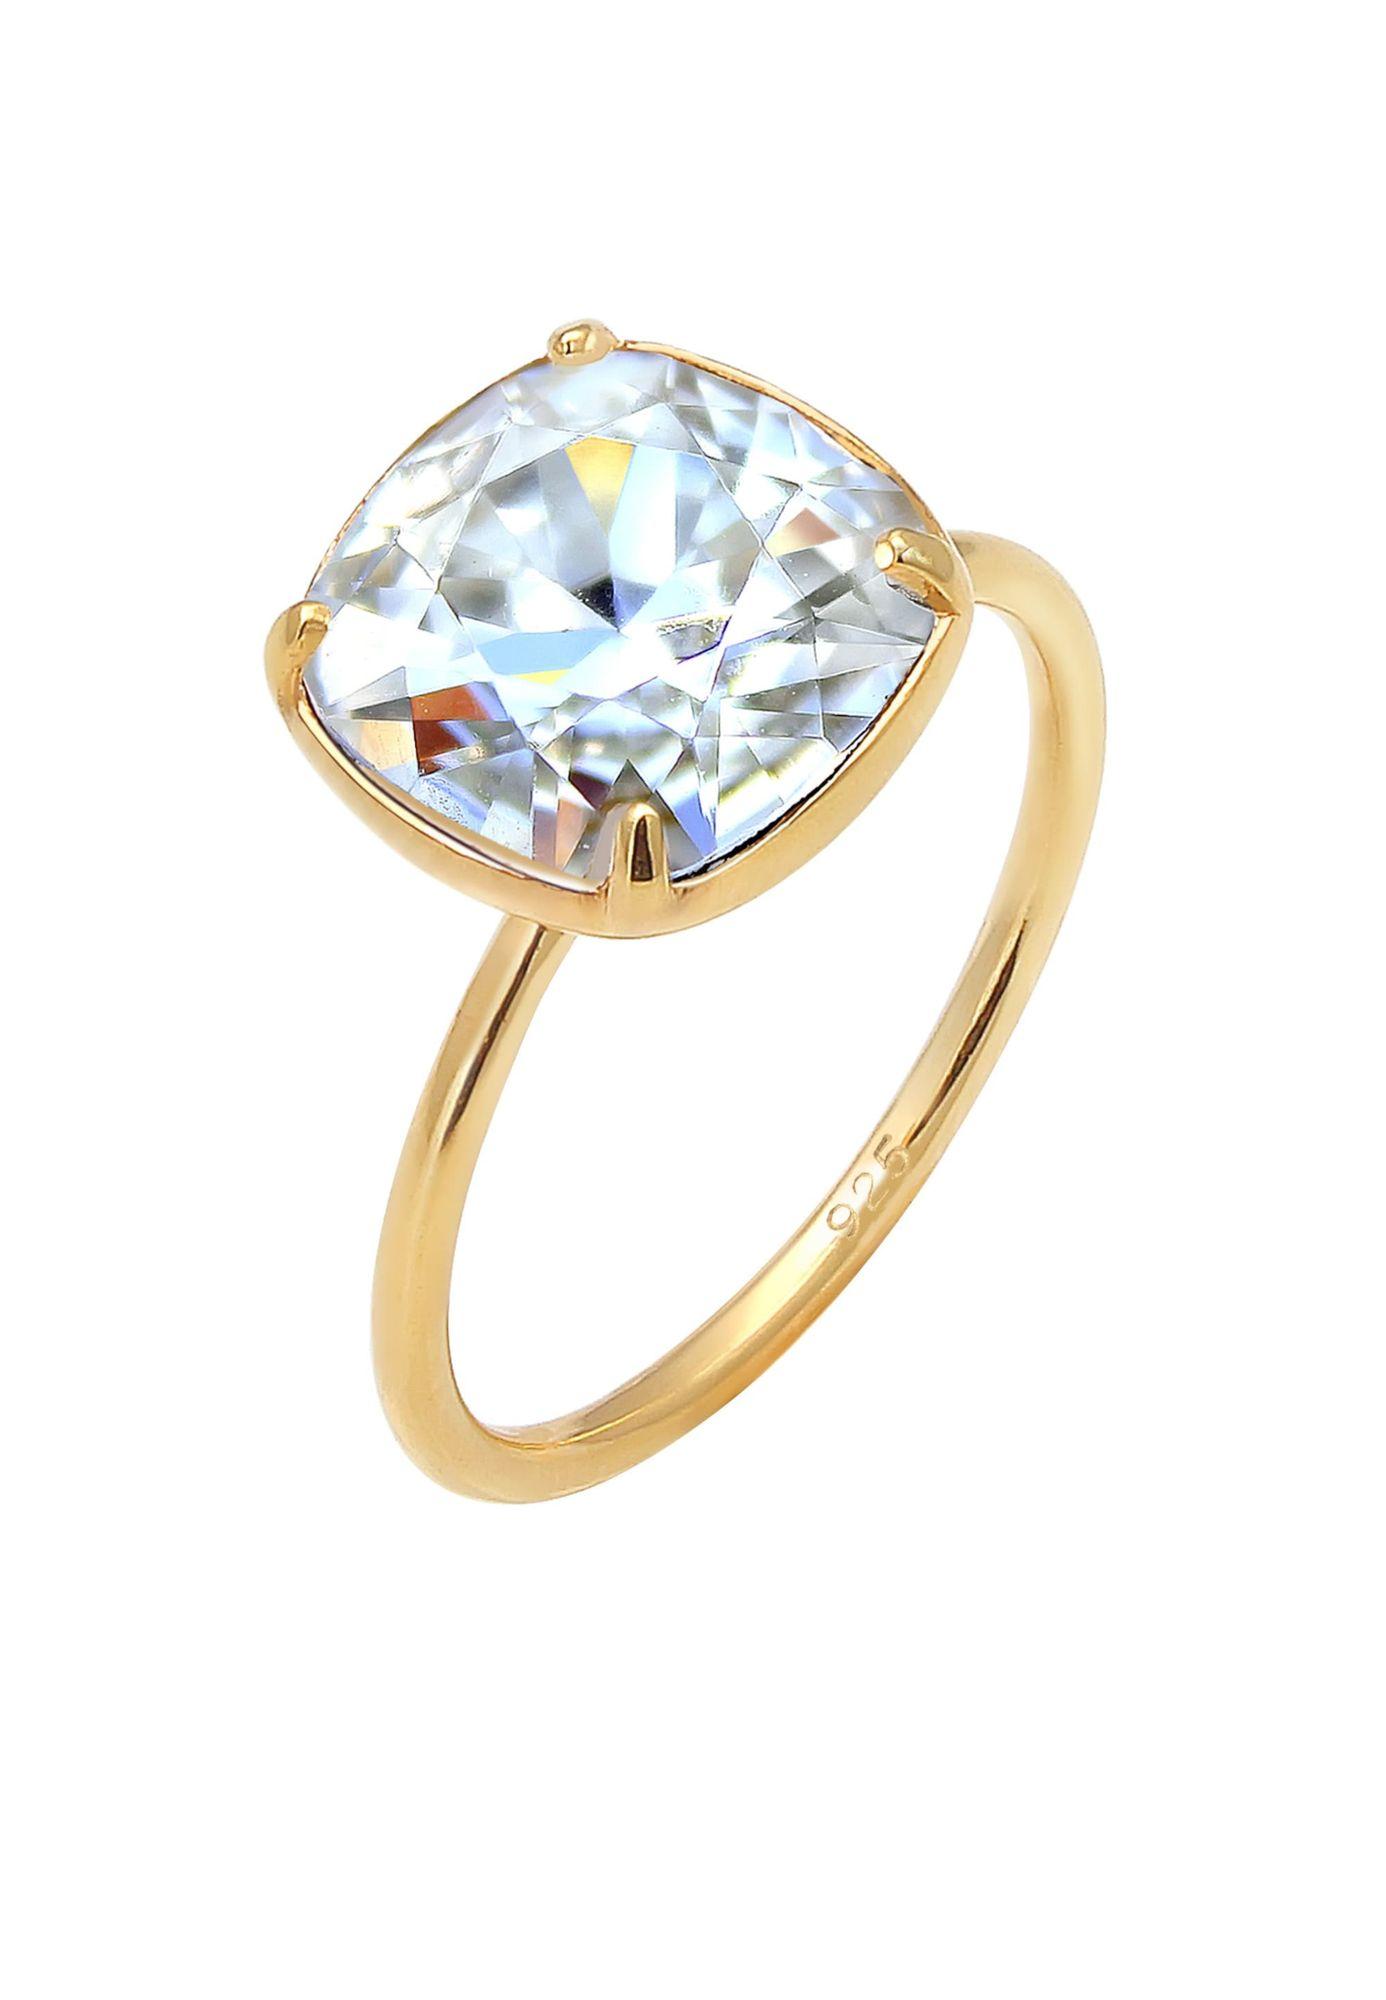 Ring Kristall Ring, Verlobungsring